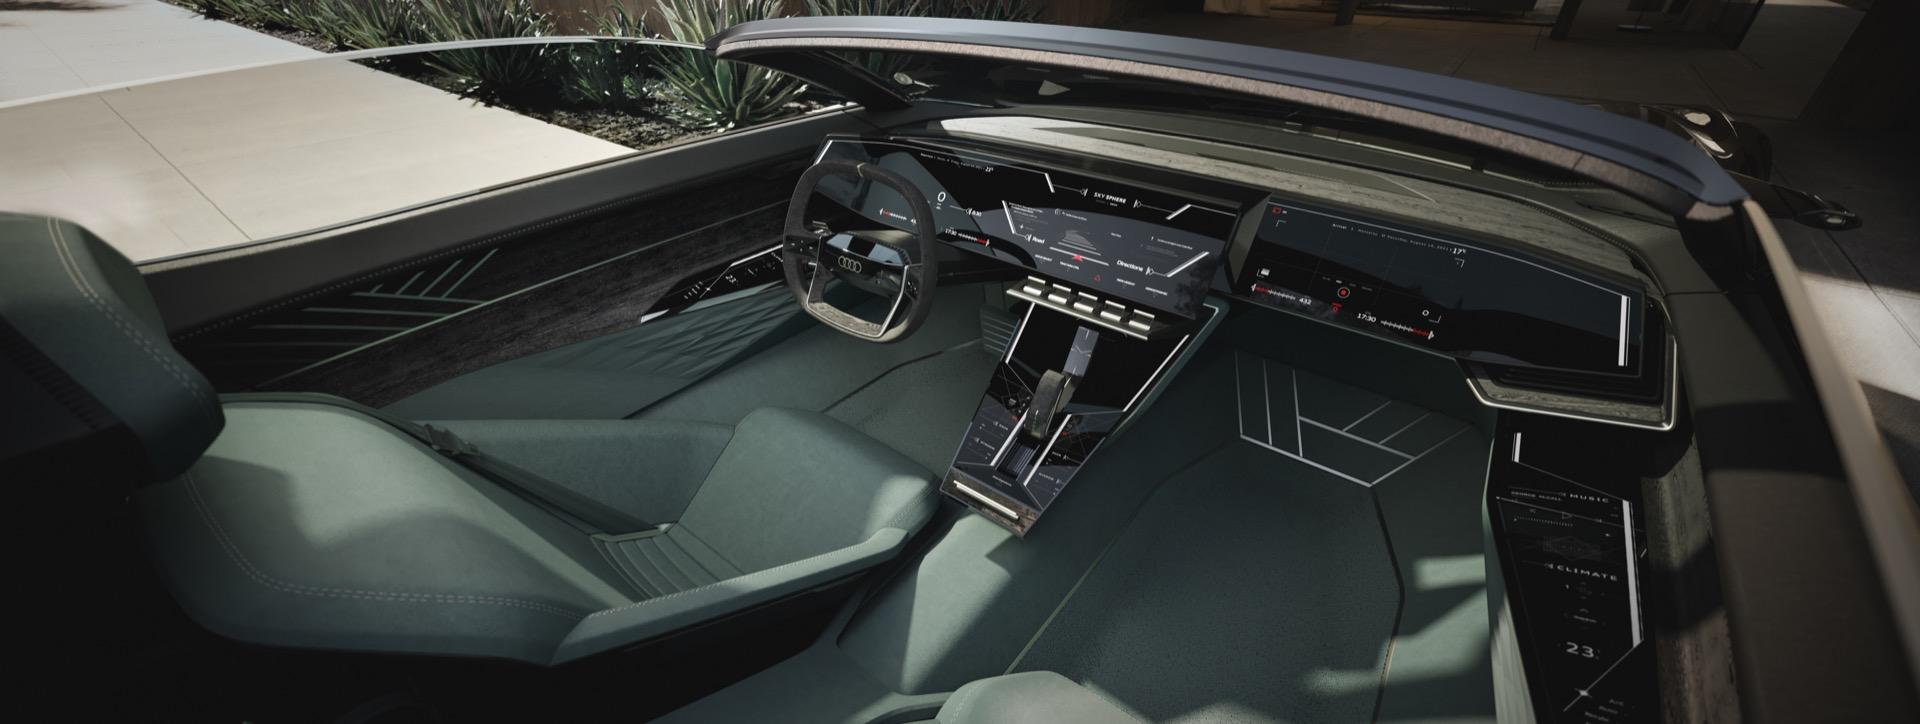 Audi Skysphere Concept 7